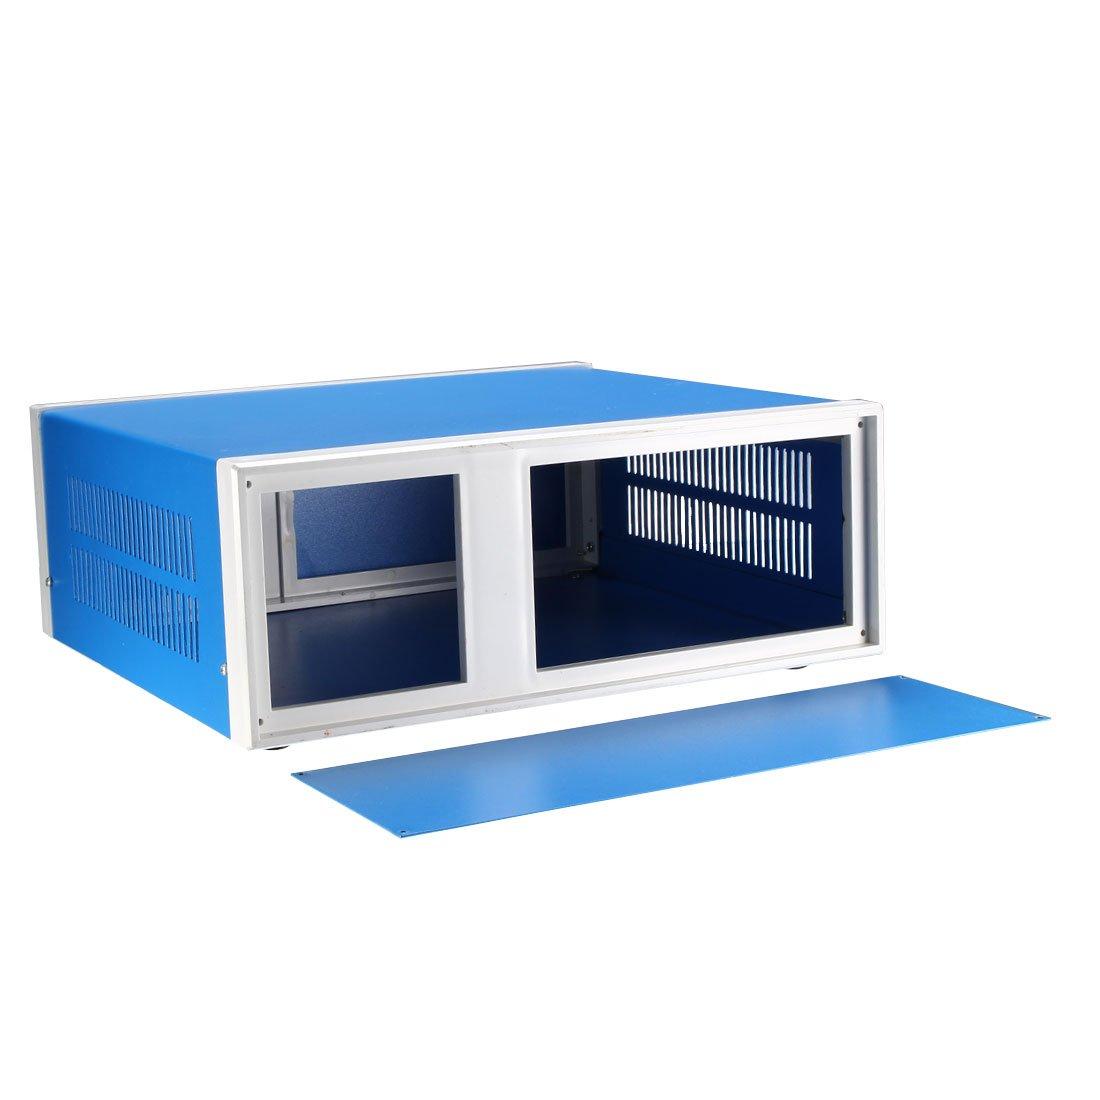 sourcingmap Metal Blue Project Junction Box Enclosure Case 250 x 190 x 110mm//9.84 x 7.48 x 4.33inch